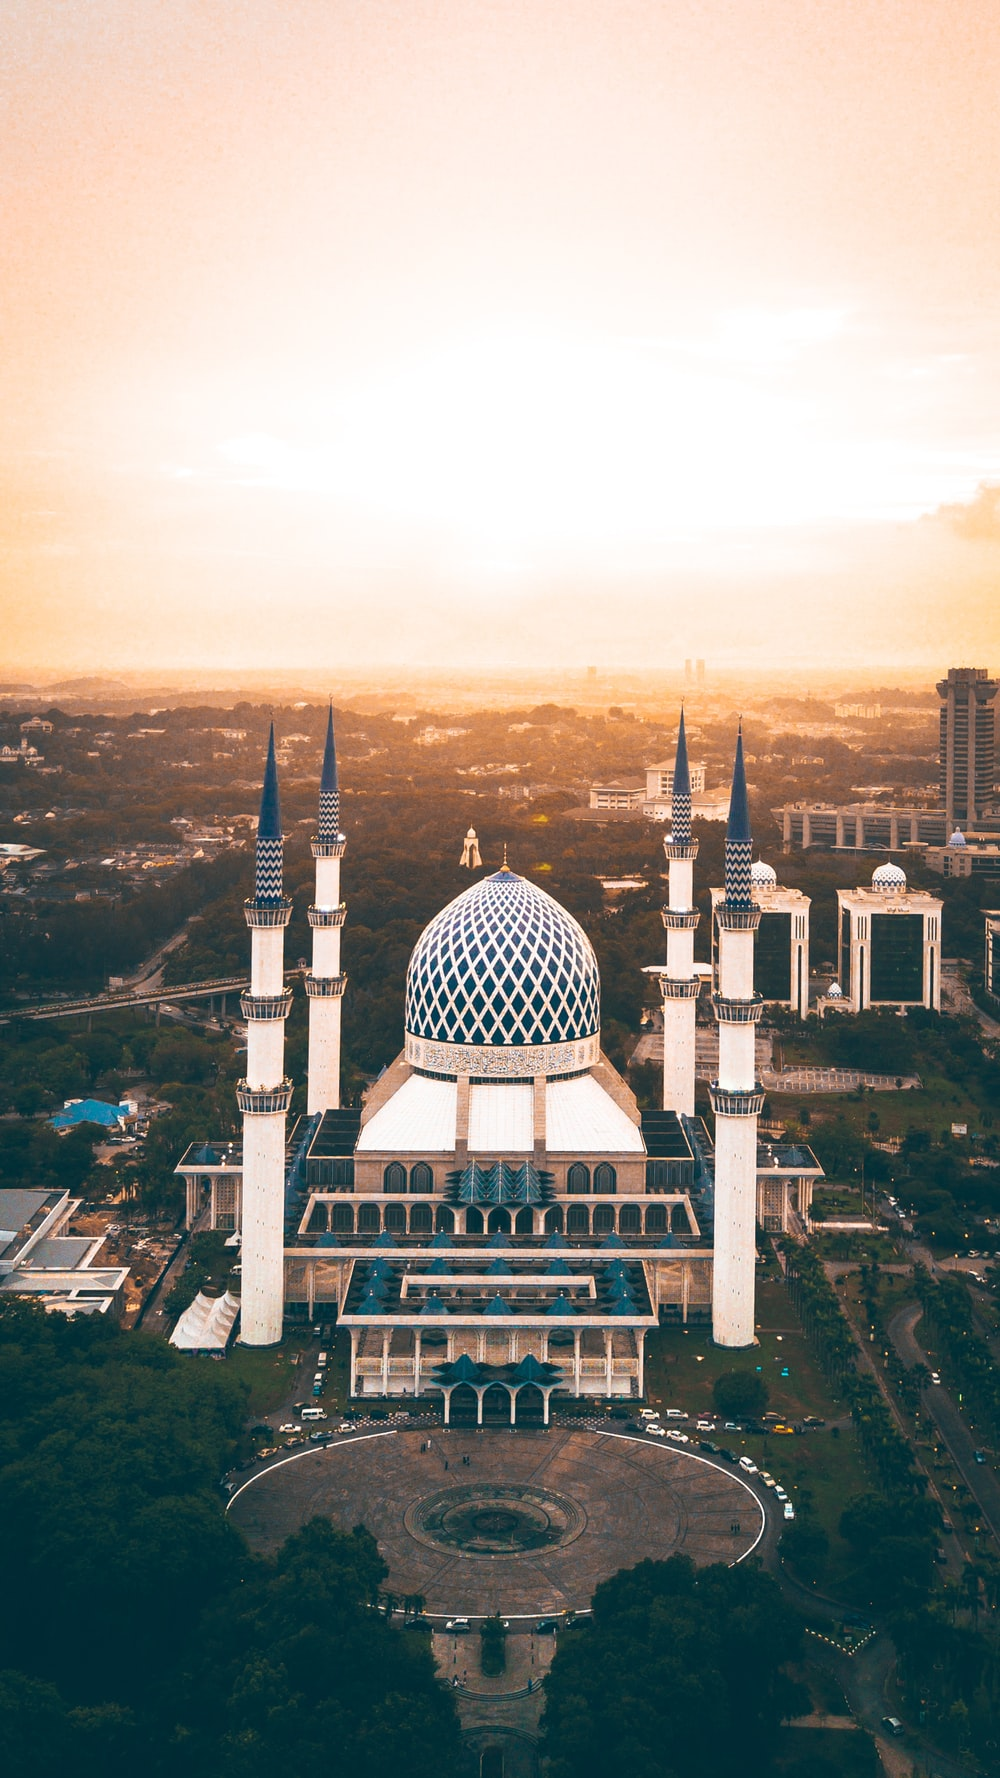 Blue Mosque, Turkey during golden hour